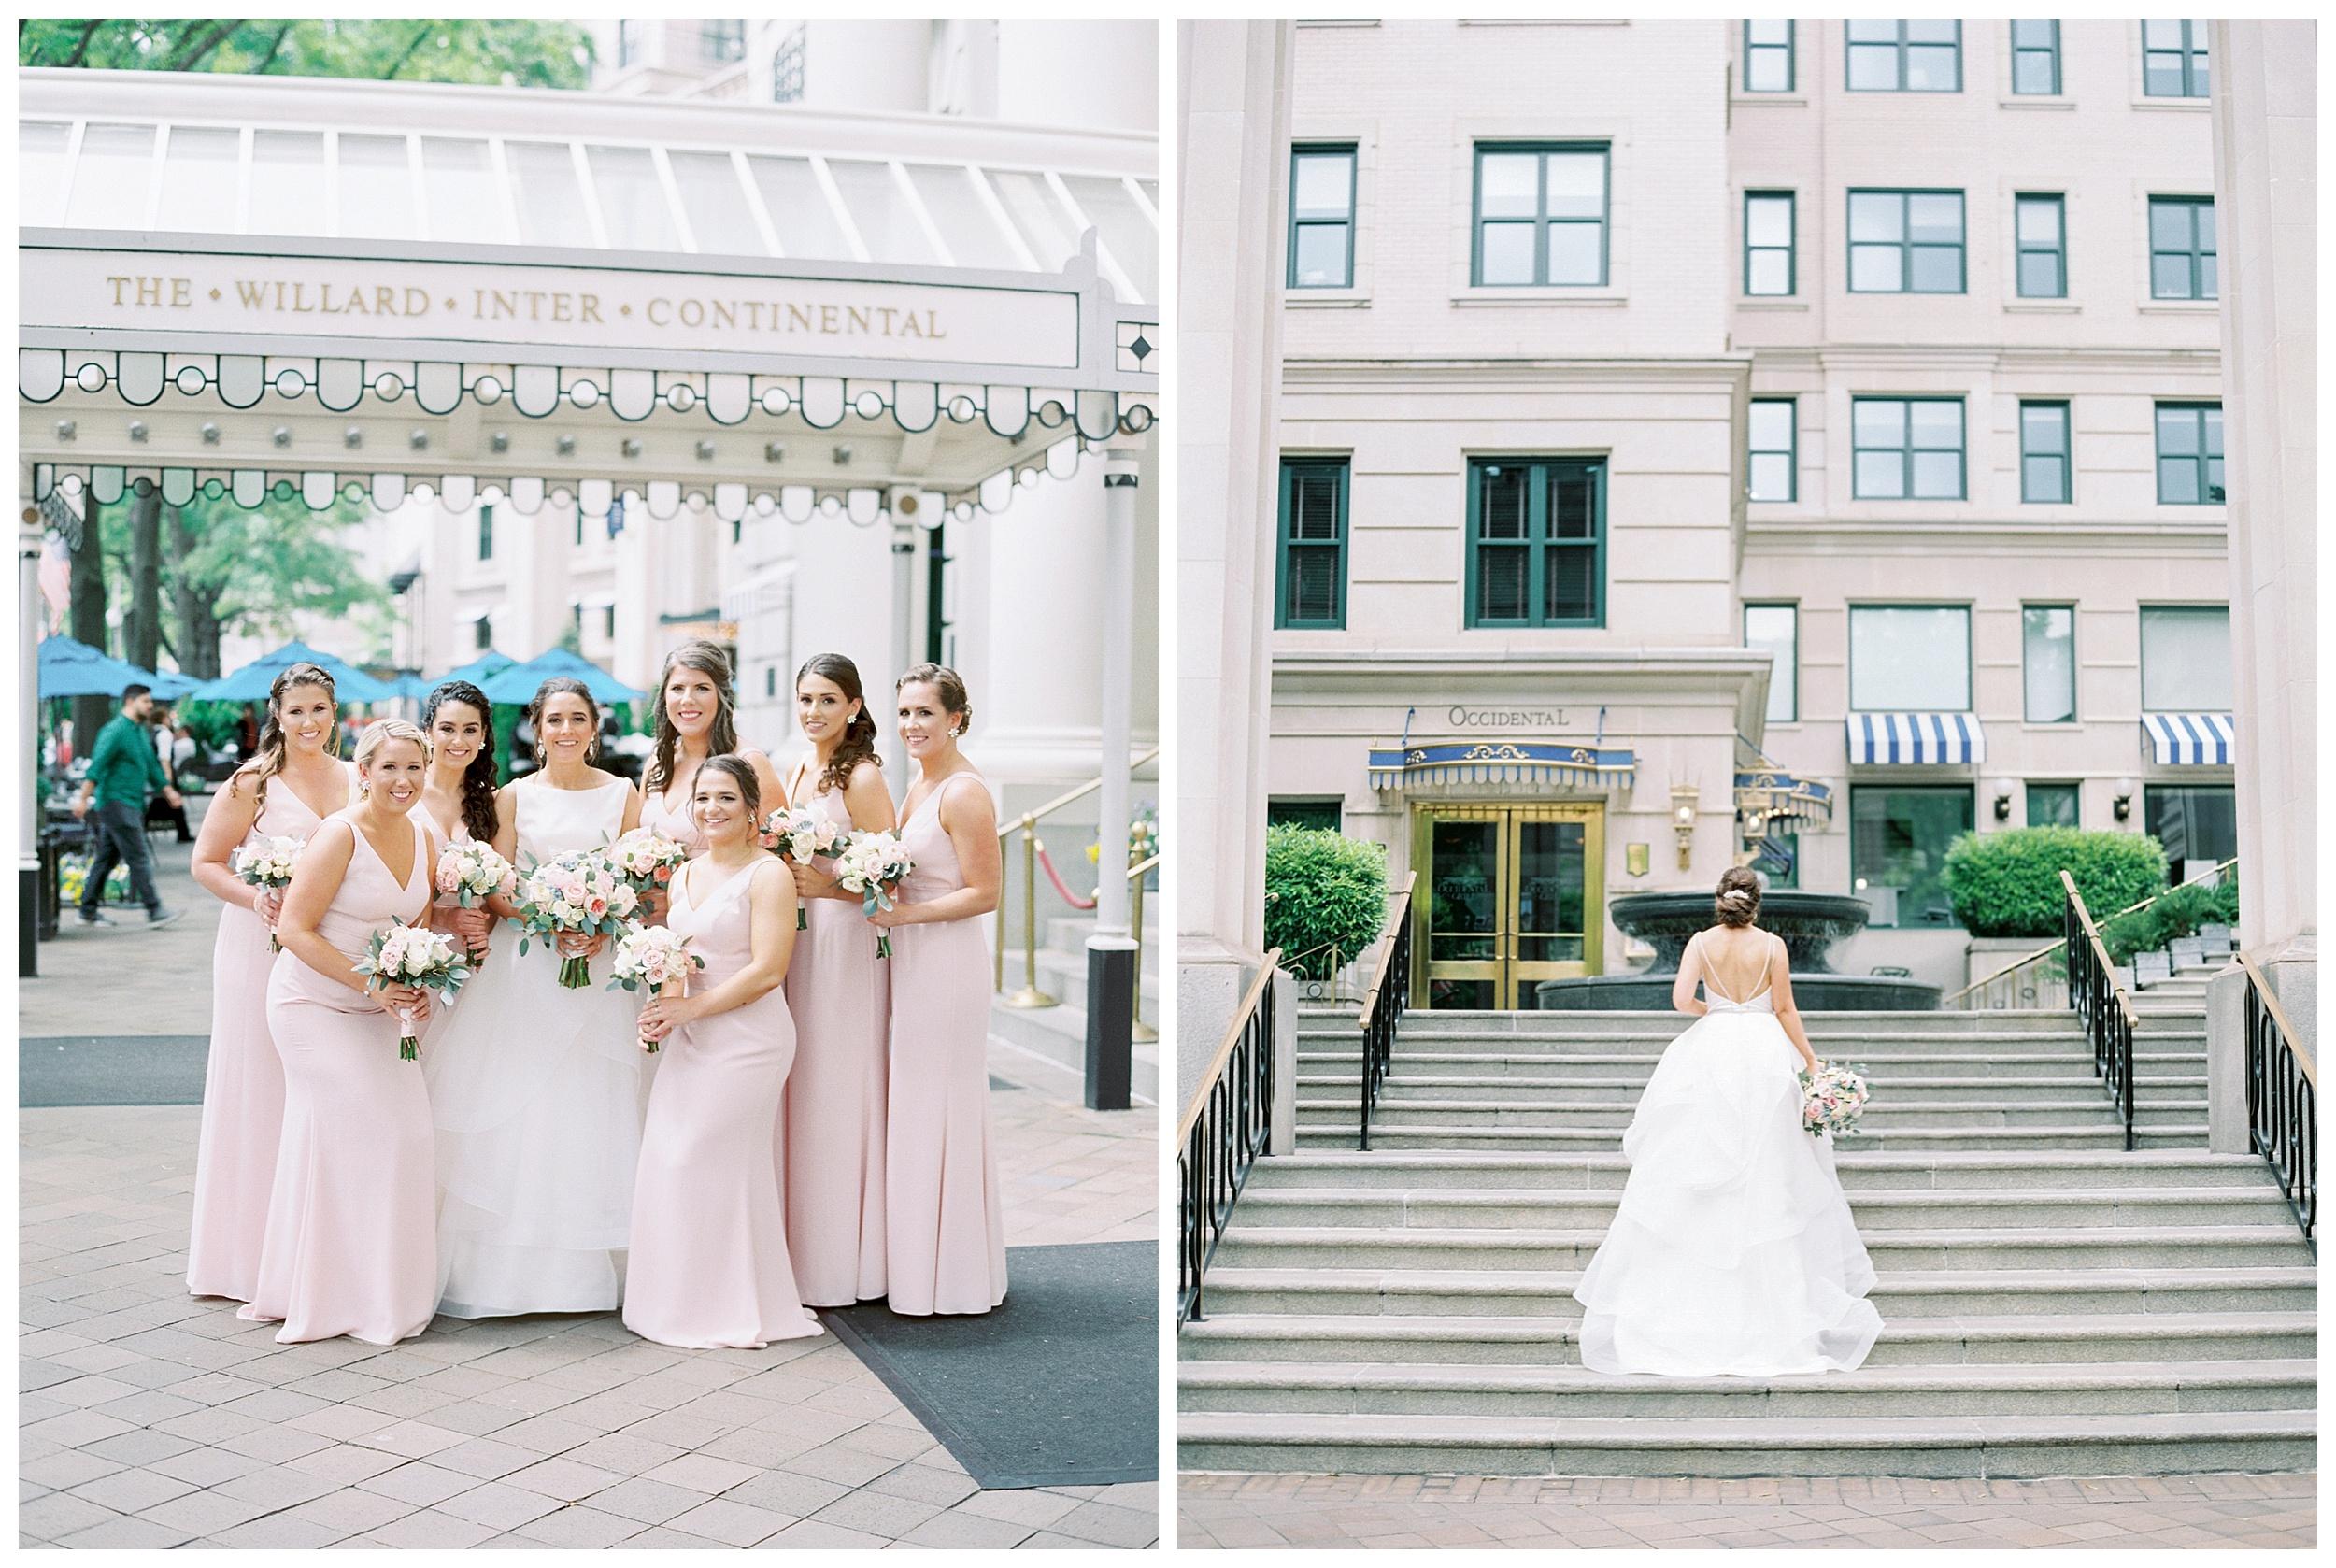 DAR Constitution Hall Wedding Wedding | Daughters of the American Revolution Wedding | District of Columbia Film Wedding Photographer Kir Tuben_0042.jpg